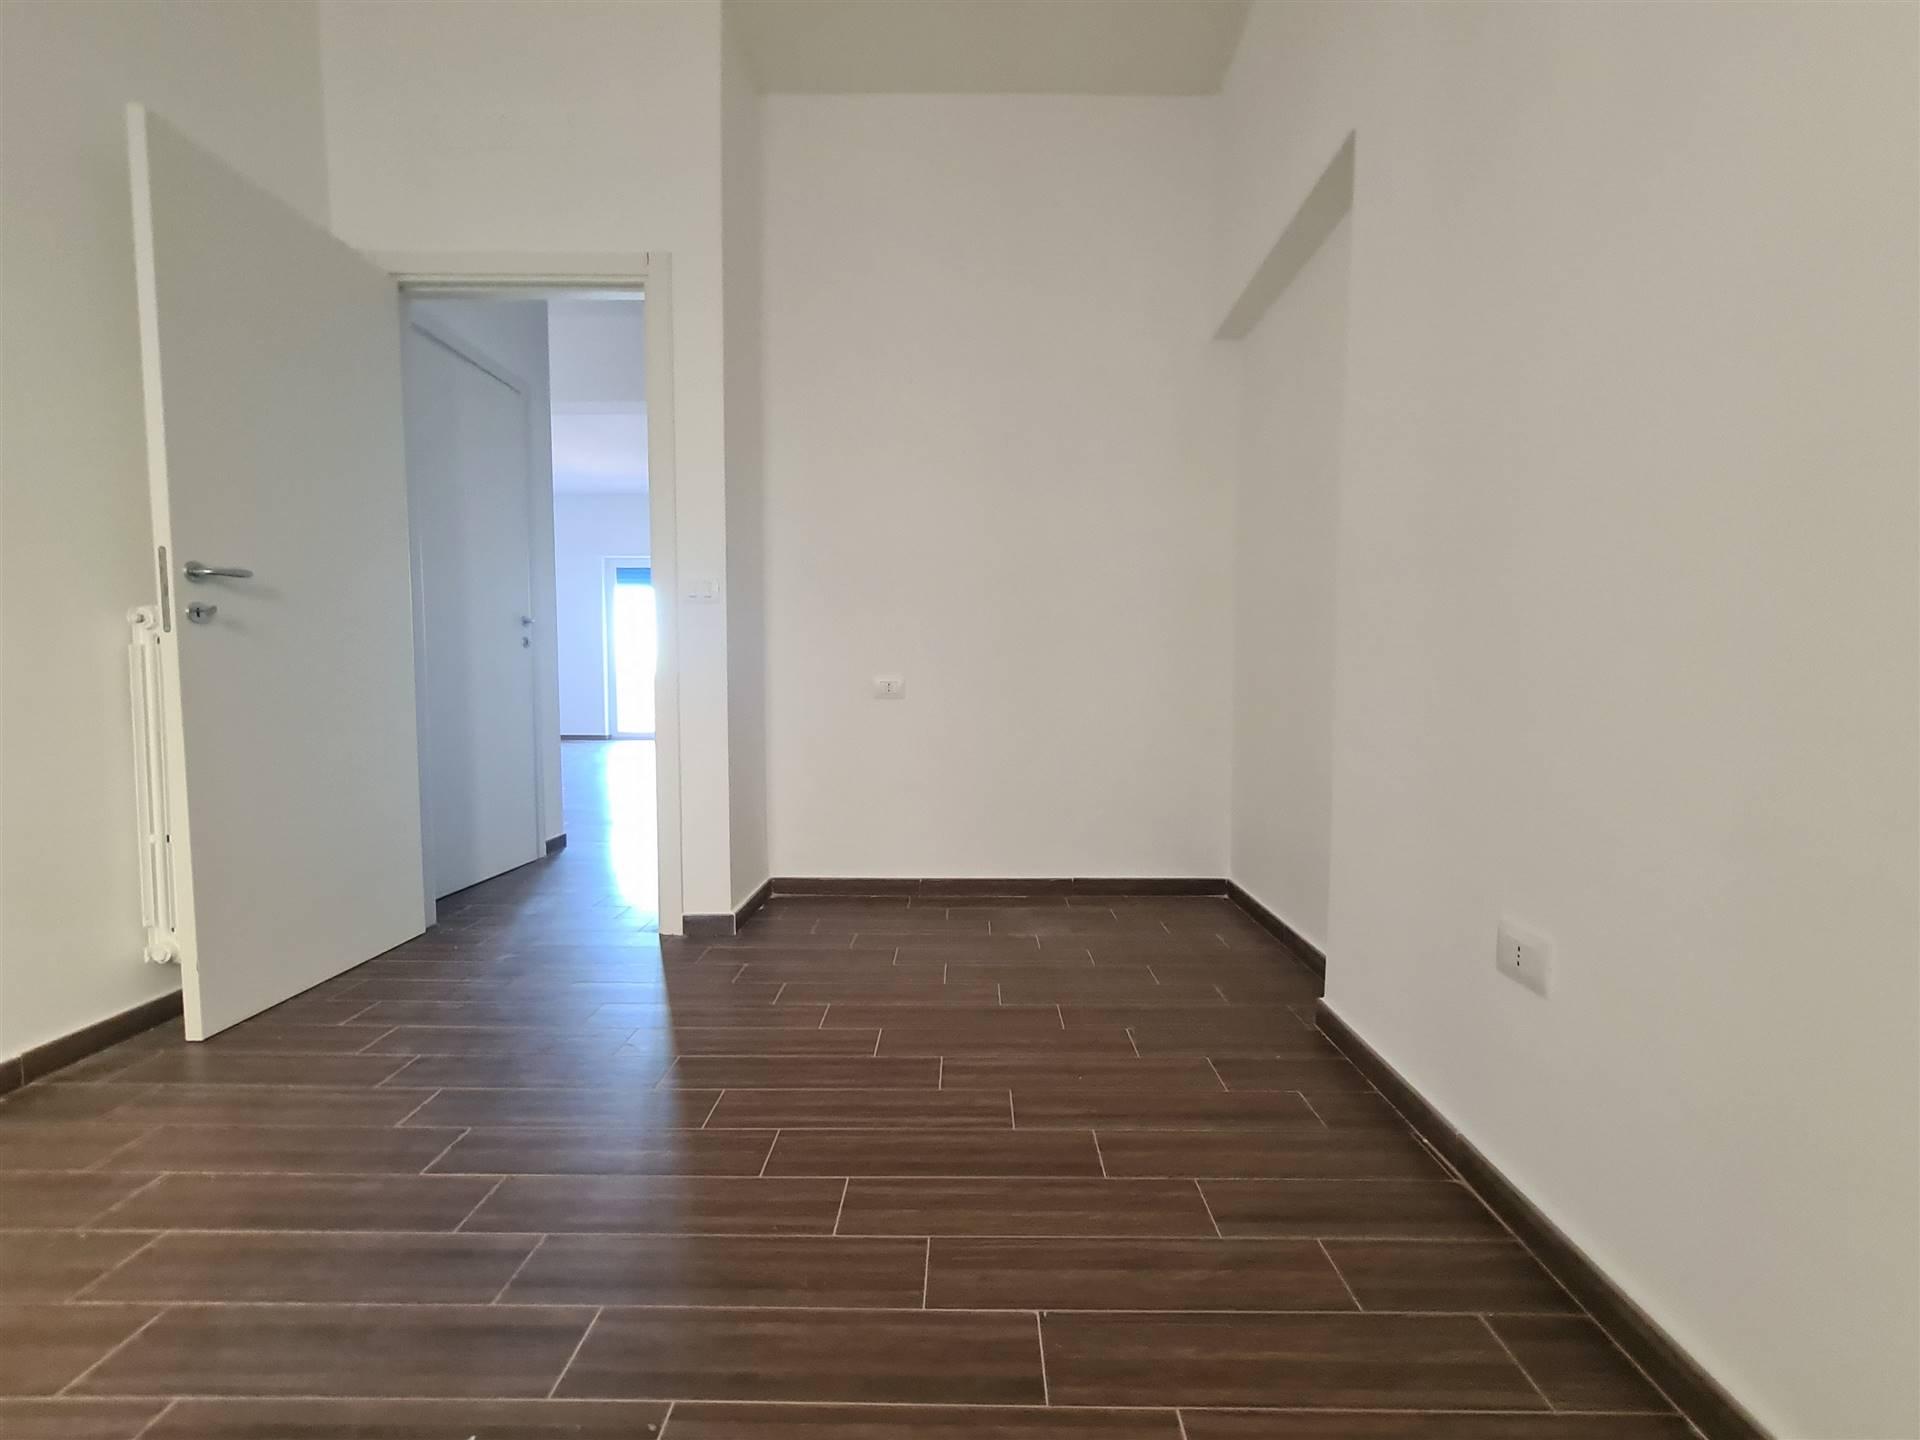 AF903-Appartamento-SANTA-MARIA-CAPUA-VETERE-Traversa-Mario-Fiore